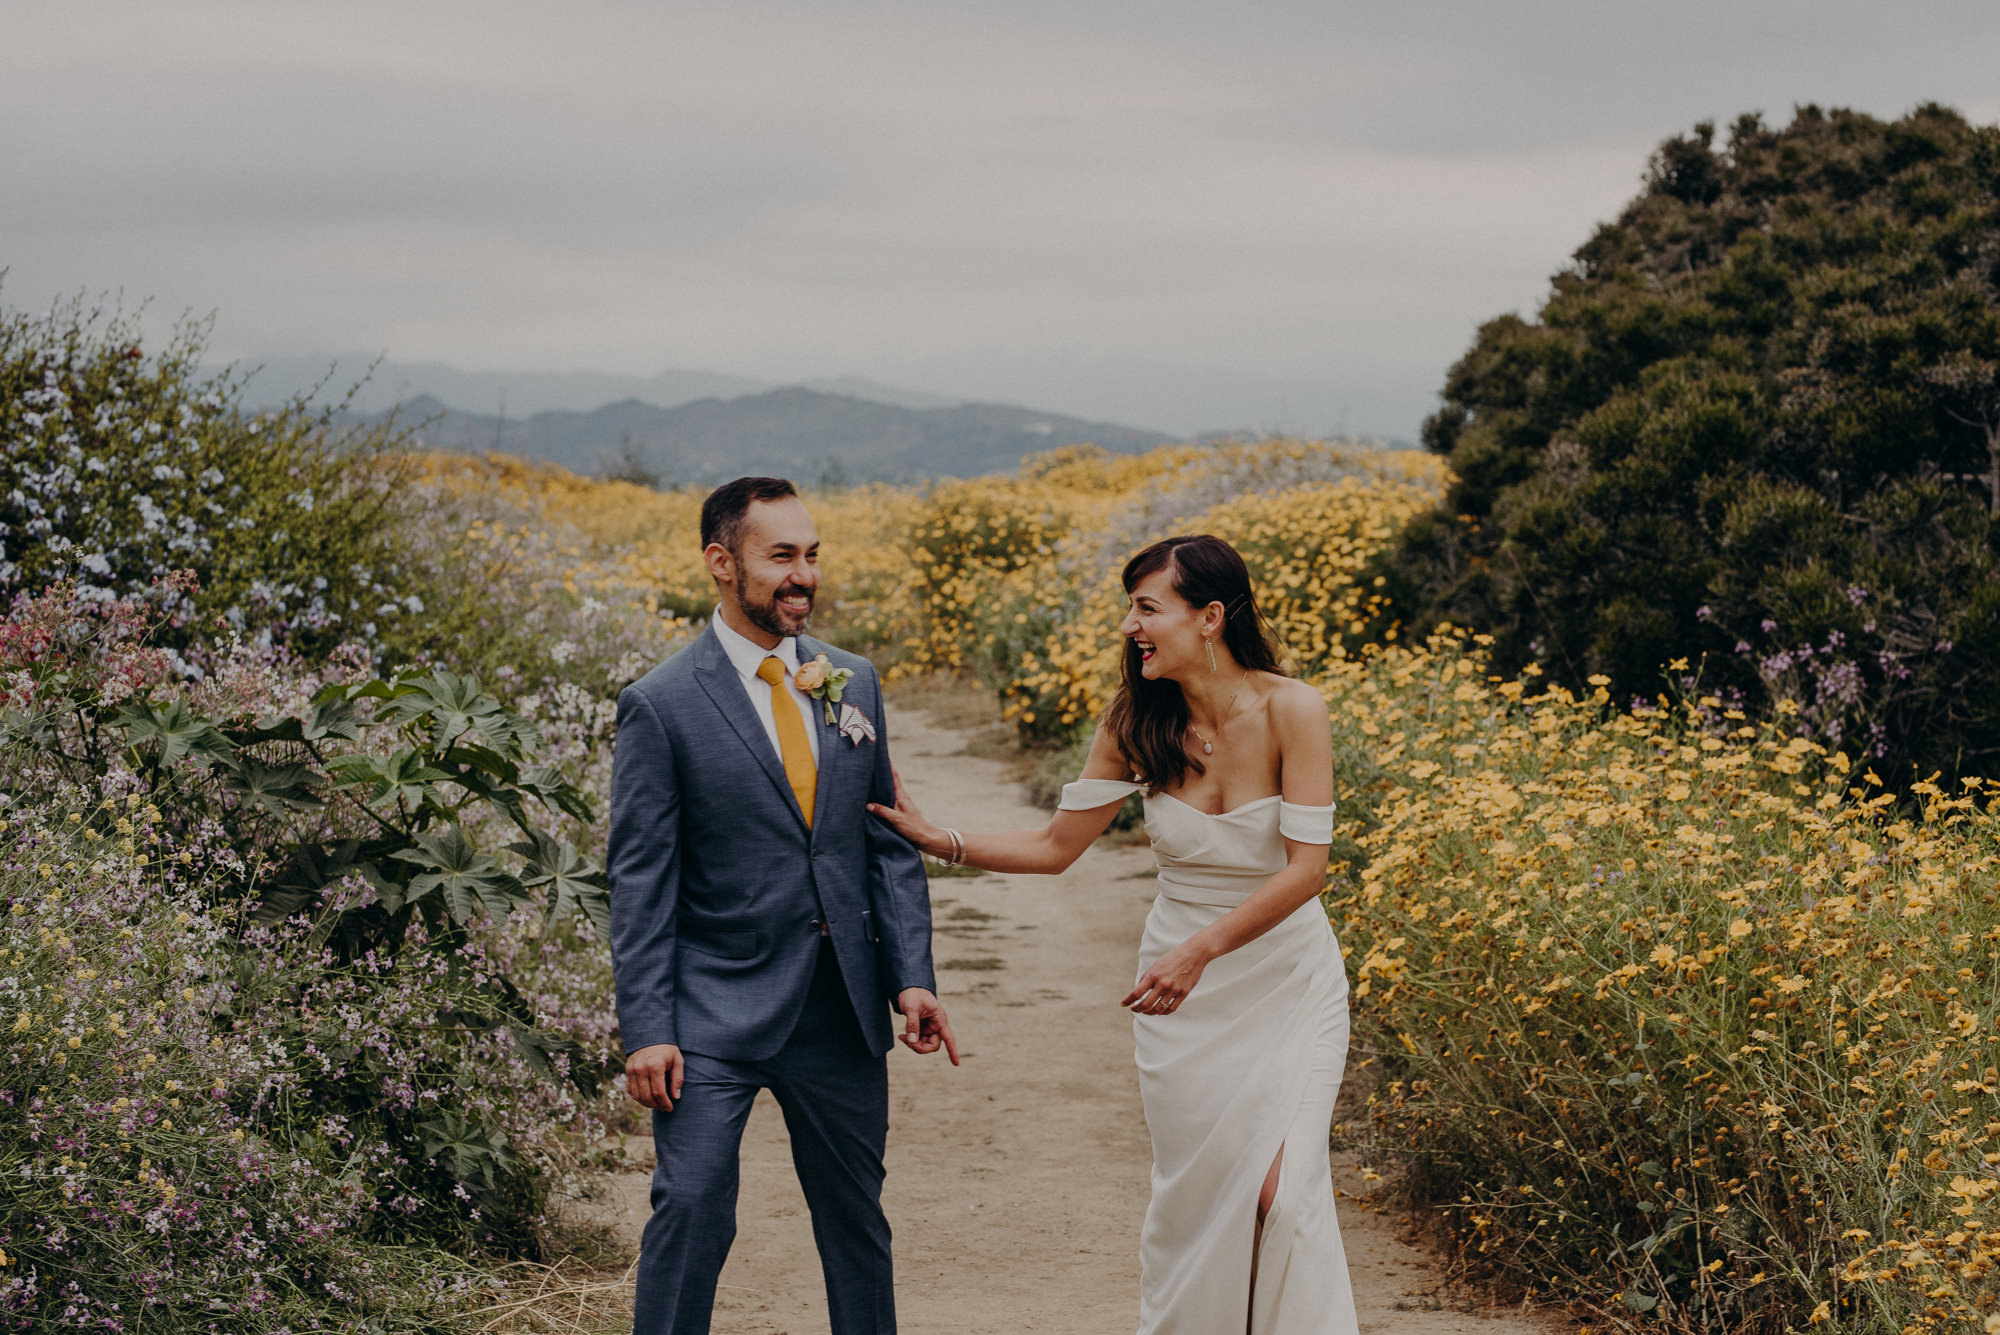 elopement photographer in los angeles - la wedding photographer - isaiahandtaylor.com-027.jpg